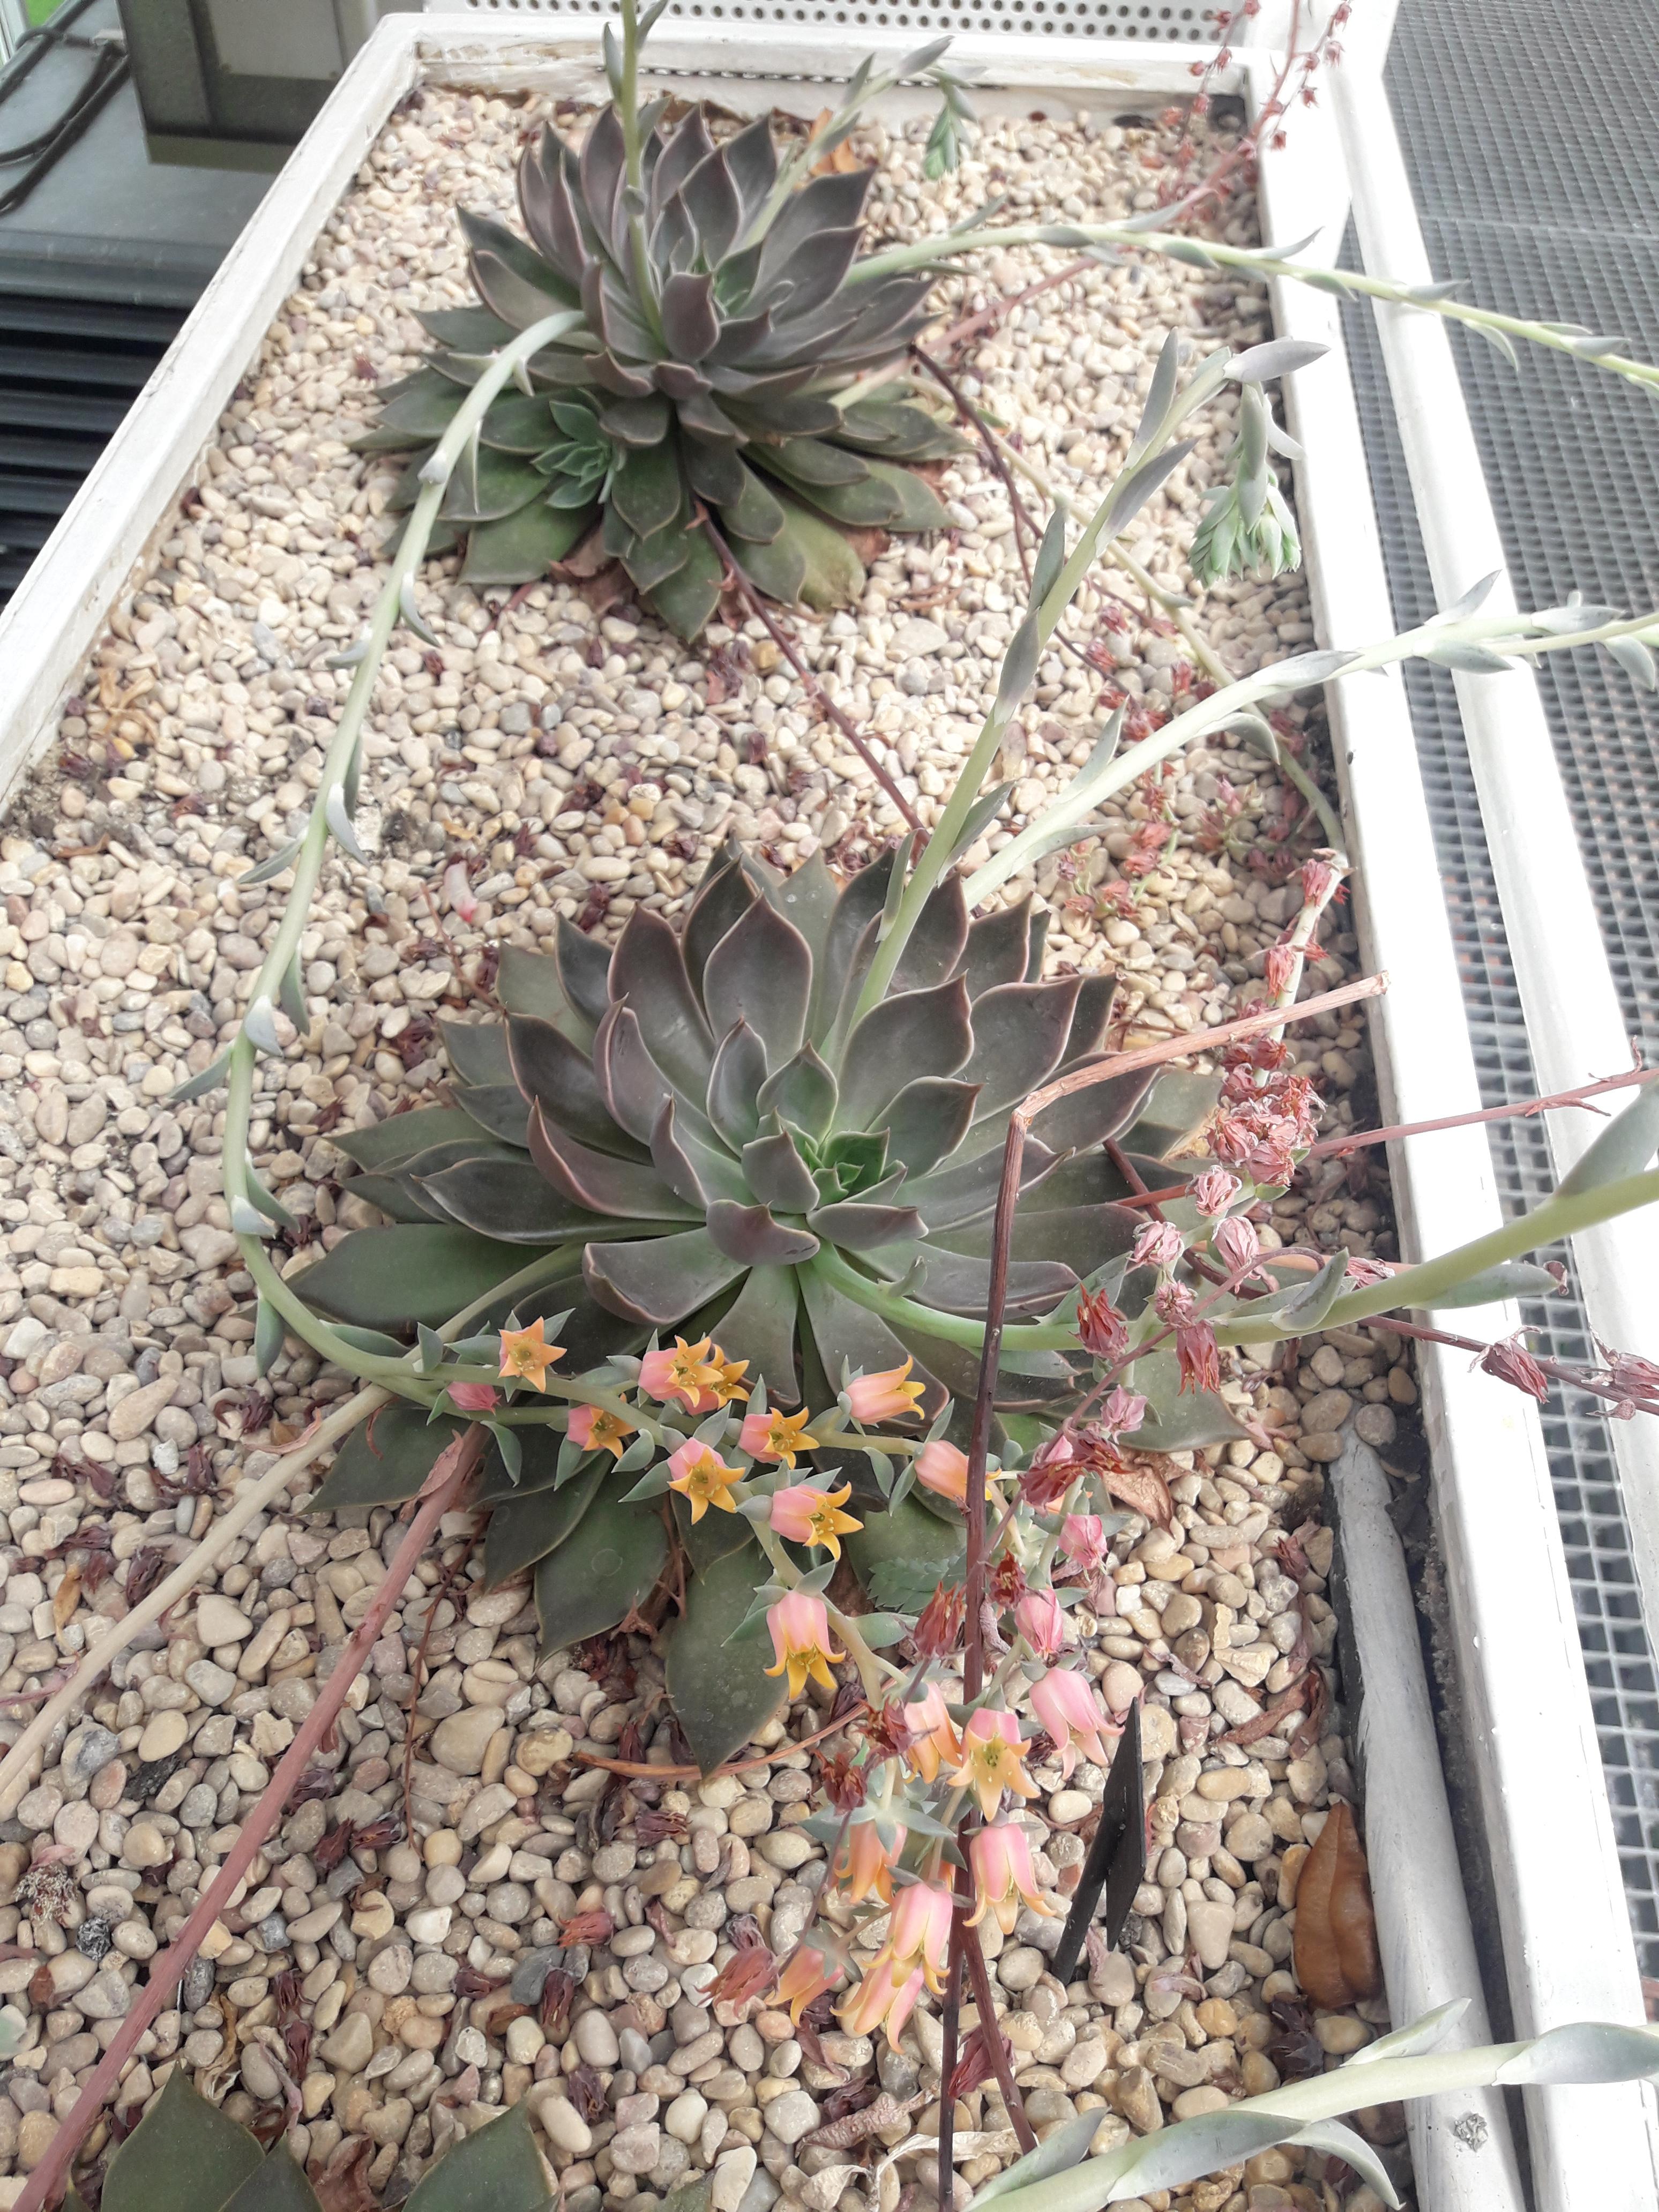 Echeveria gibbiflora var. metallica